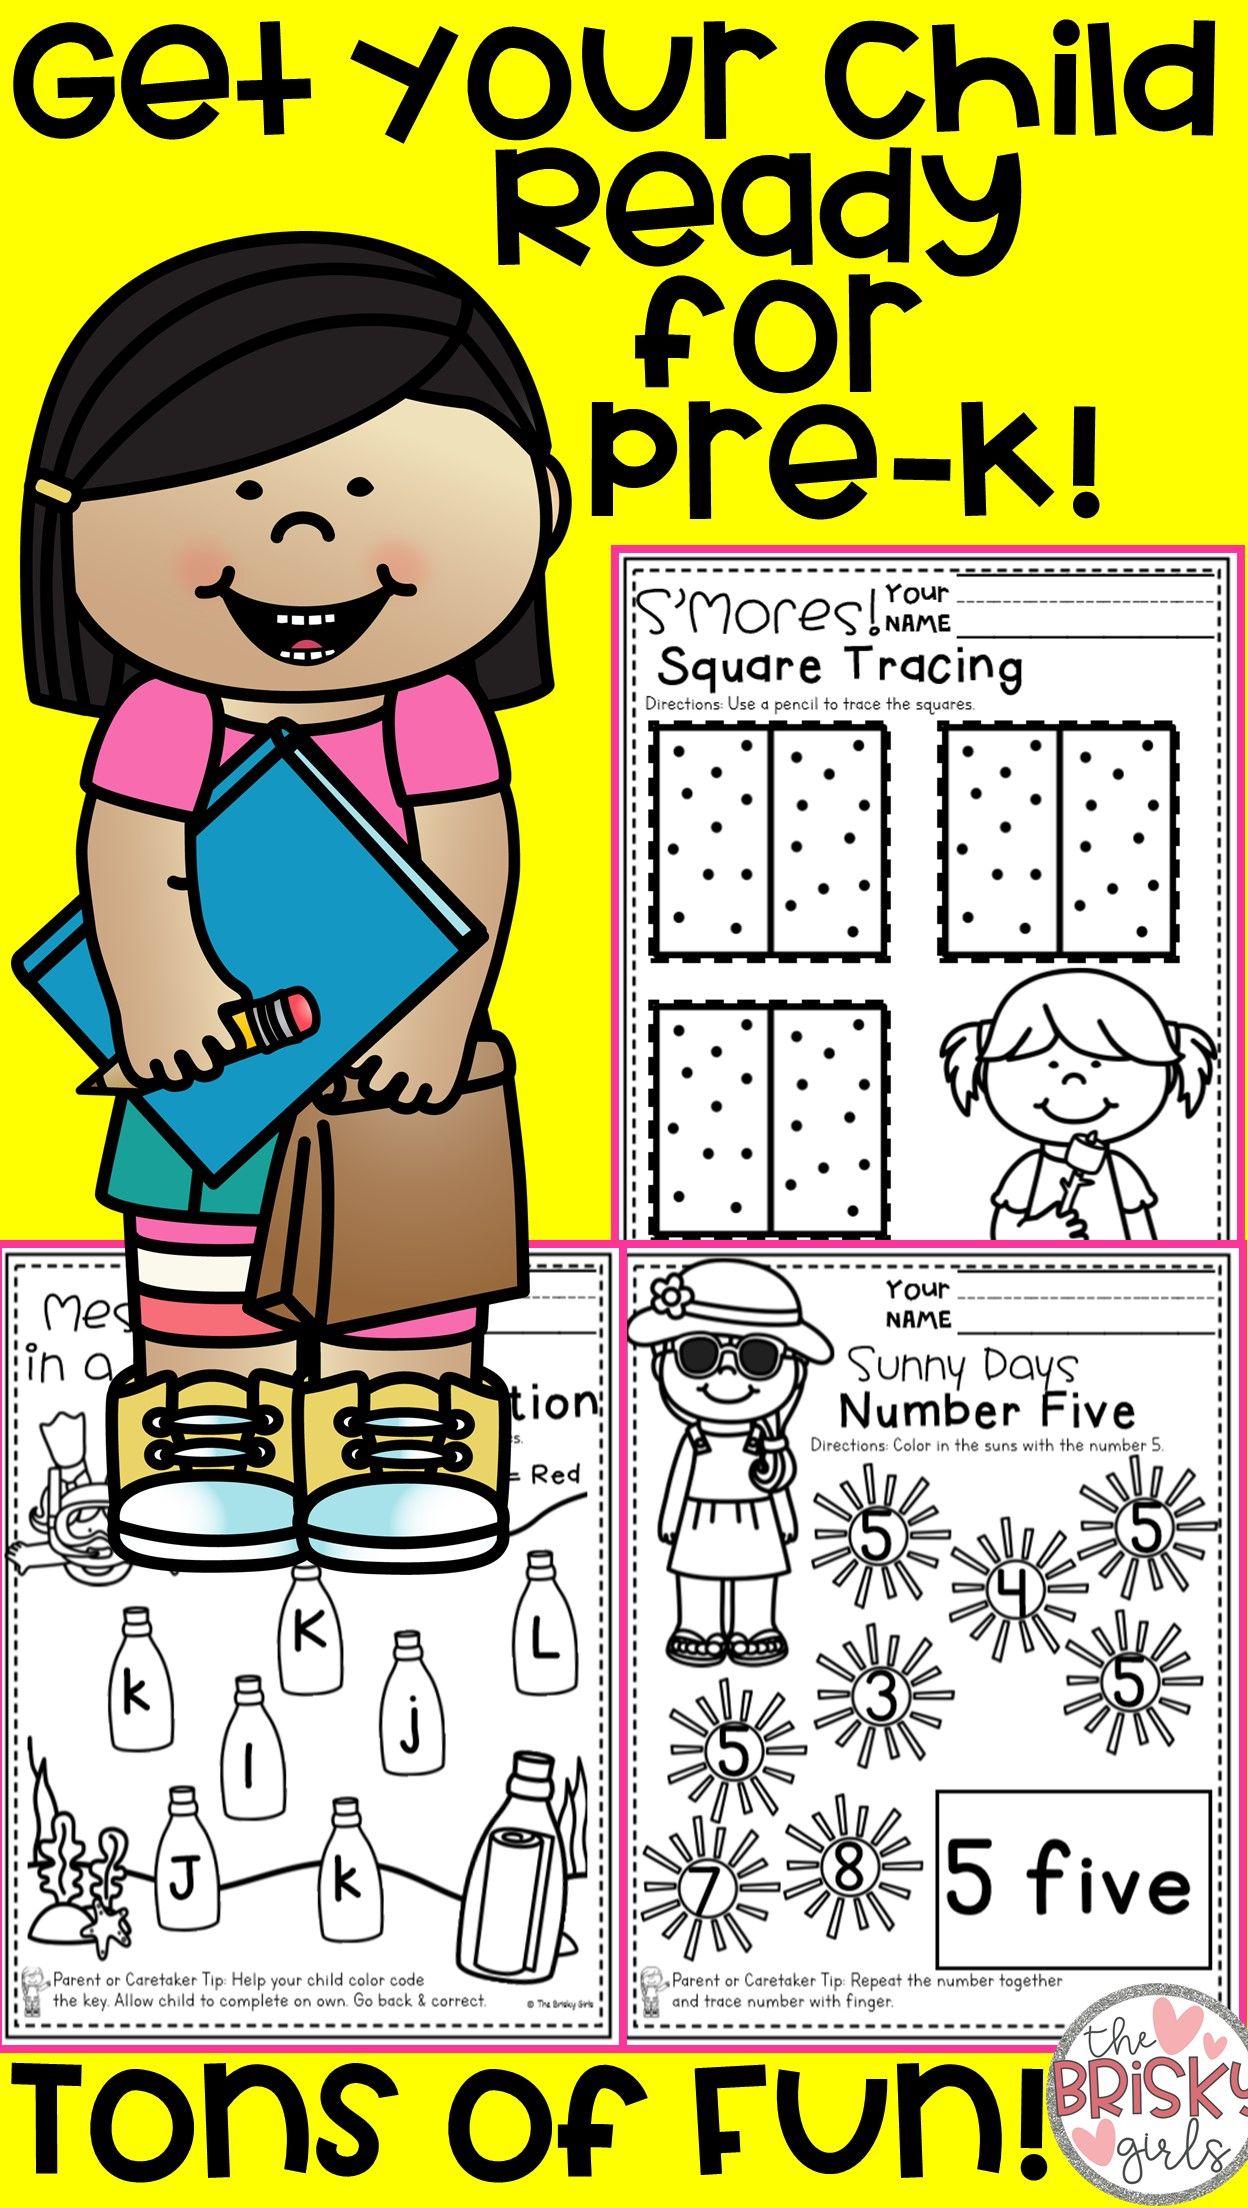 Preschool Summer Packet Preschool Summer Printables Preschool Prek Prek Readiness Ready For Pre Preschool Summer Printables Summer Preschool Summer Packet [ 2208 x 1248 Pixel ]